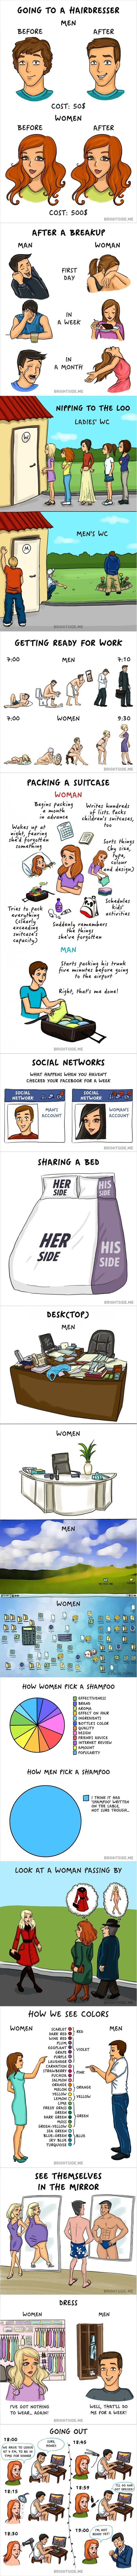 15304 Woman vs Man Funny